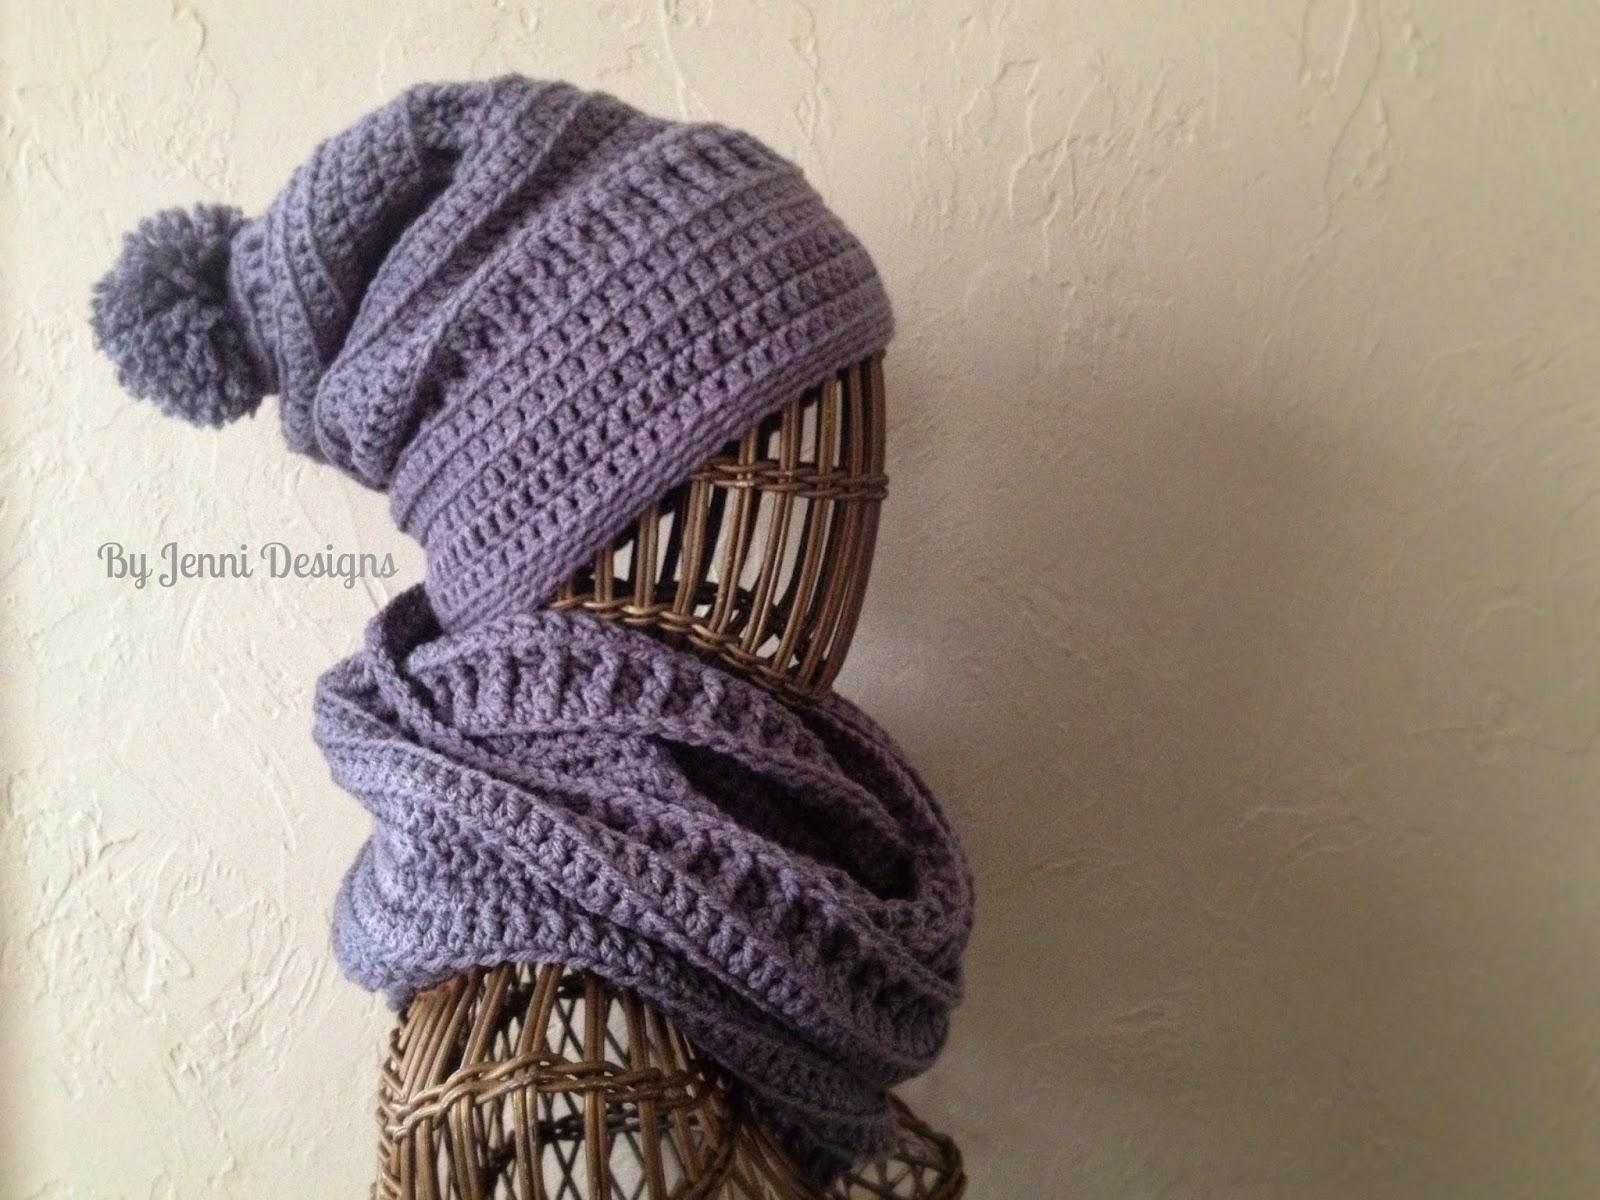 cf29f8b56db By Jenni Designs  Free Crochet Pattern  Textured Infinity Scarf